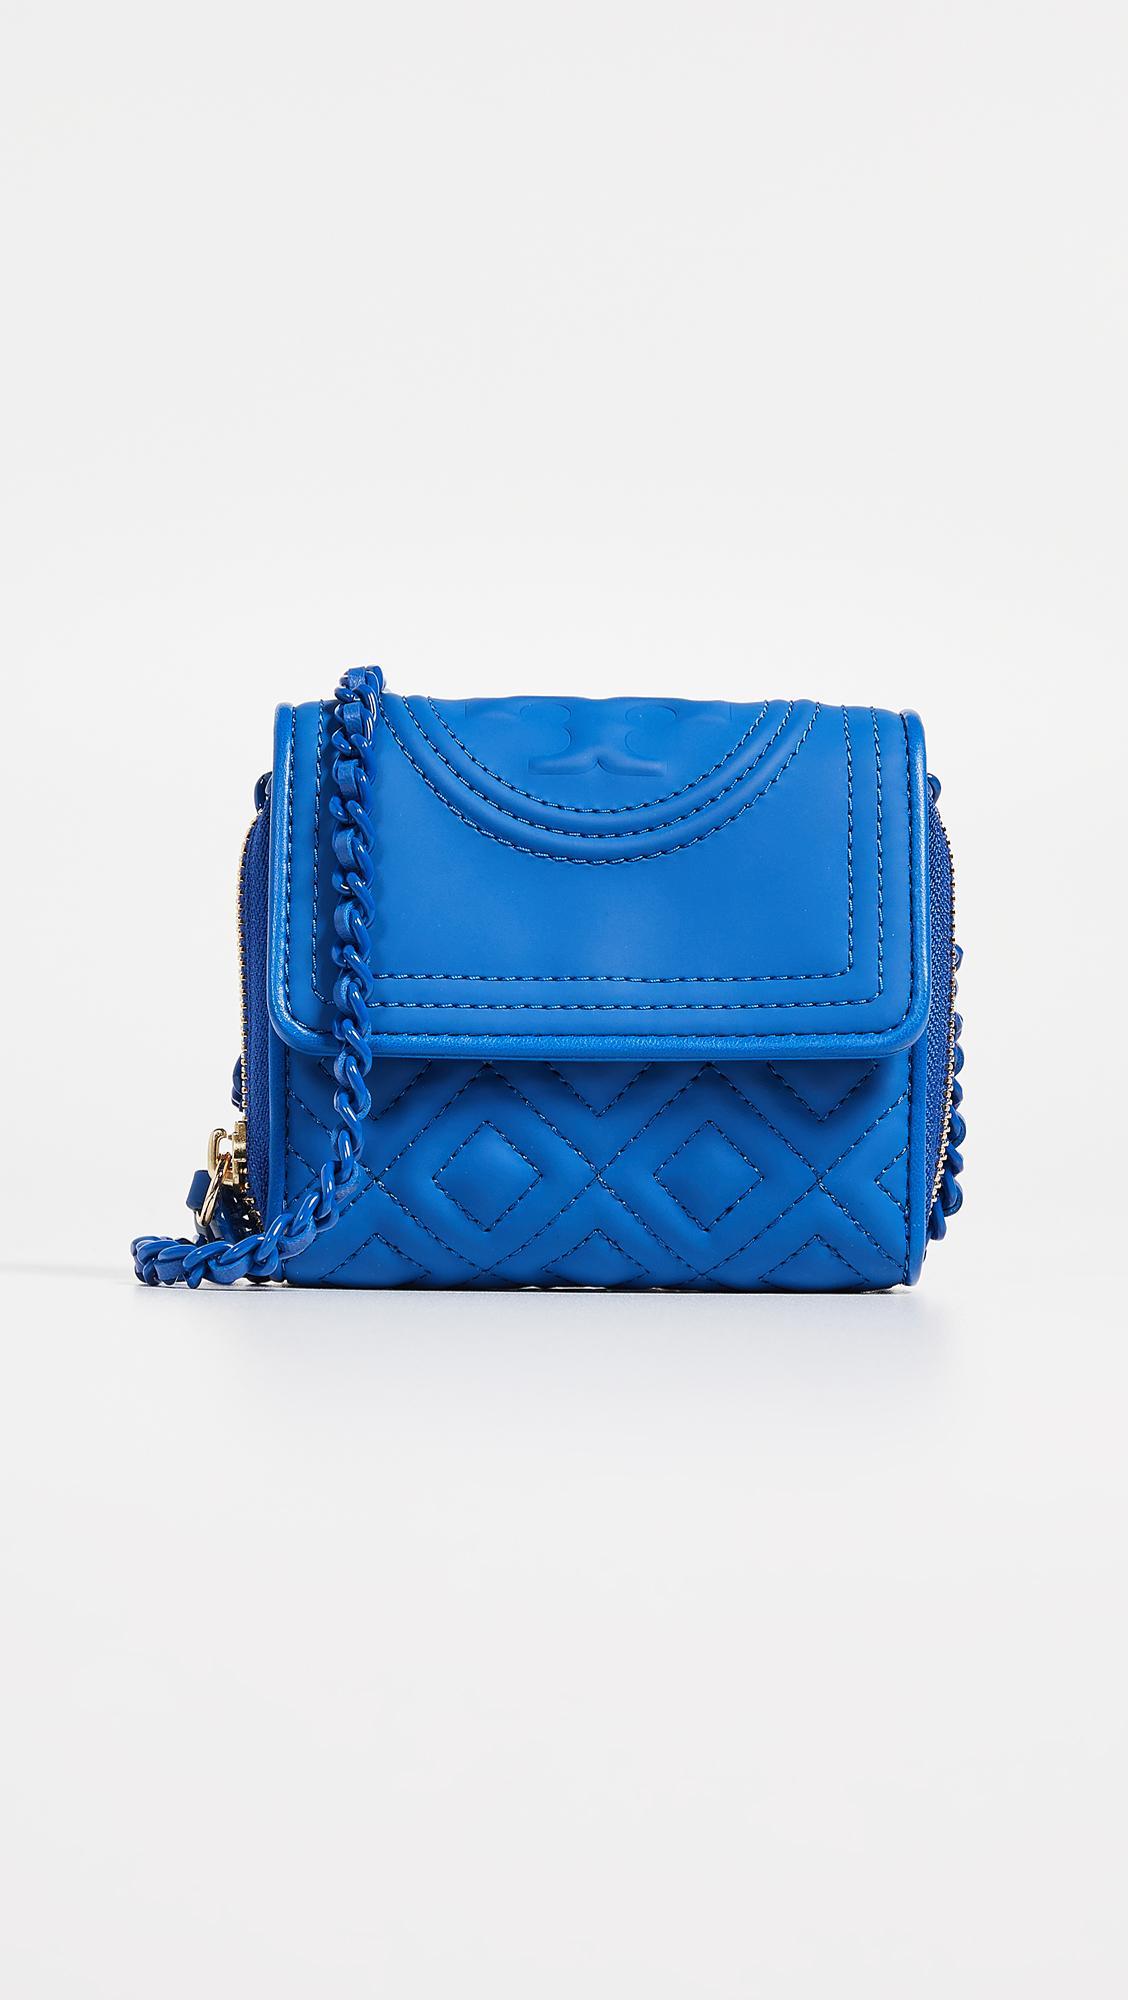 65f75d9891e2 Lyst - Tory Burch Fleming Matte Mini Chain Wallet in Blue